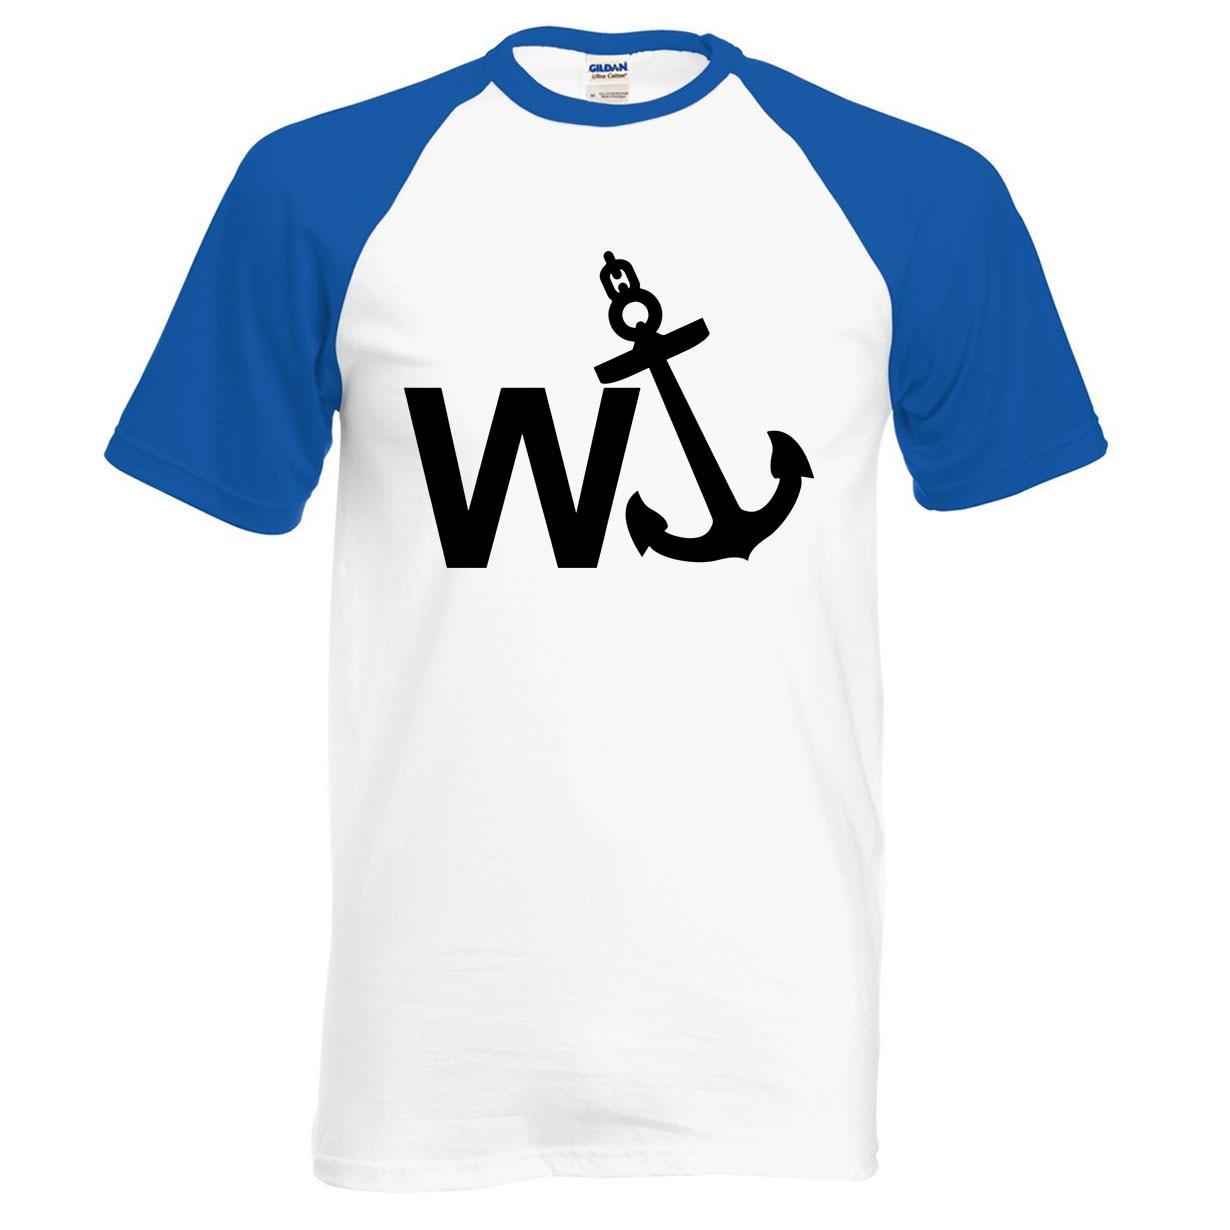 W'Anker Funny Anchor Rude Comedy men t shirt 2019 summer 100% cotton high quality raglan men t-shirt fashion short sleeve shirt